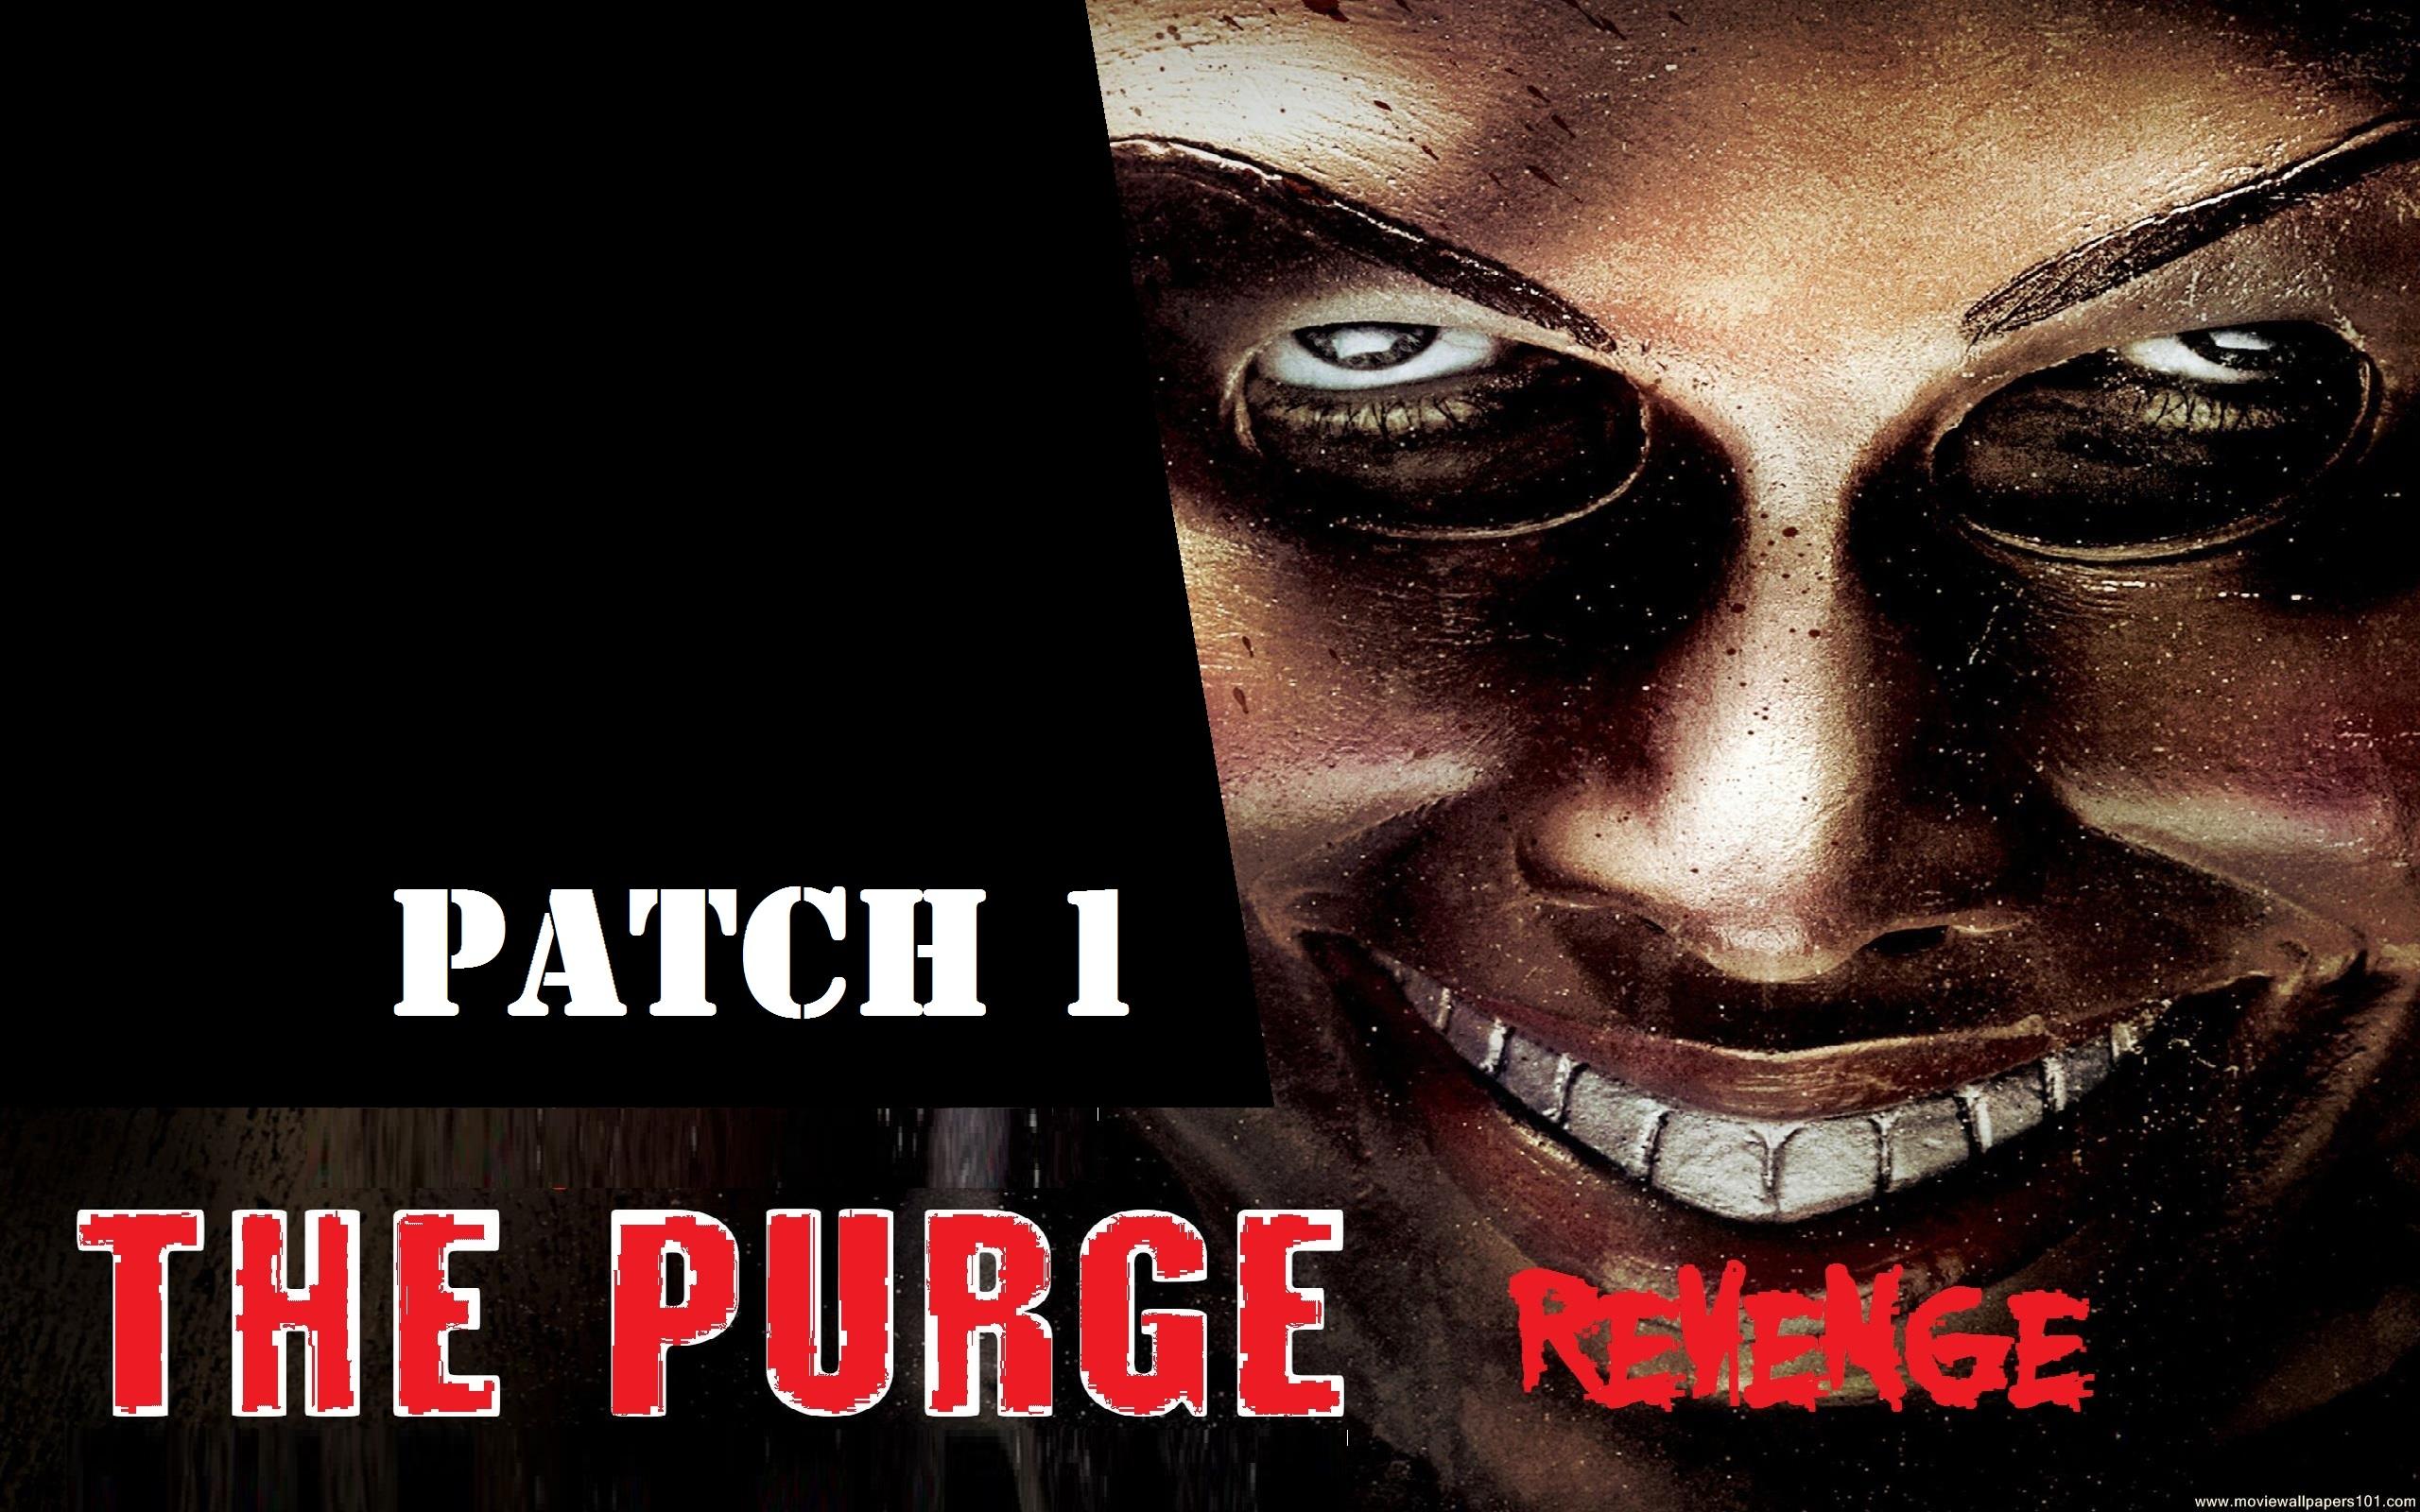 The Purge - Revenge - Patch - Purge 2013 Movie Poster - HD Wallpaper